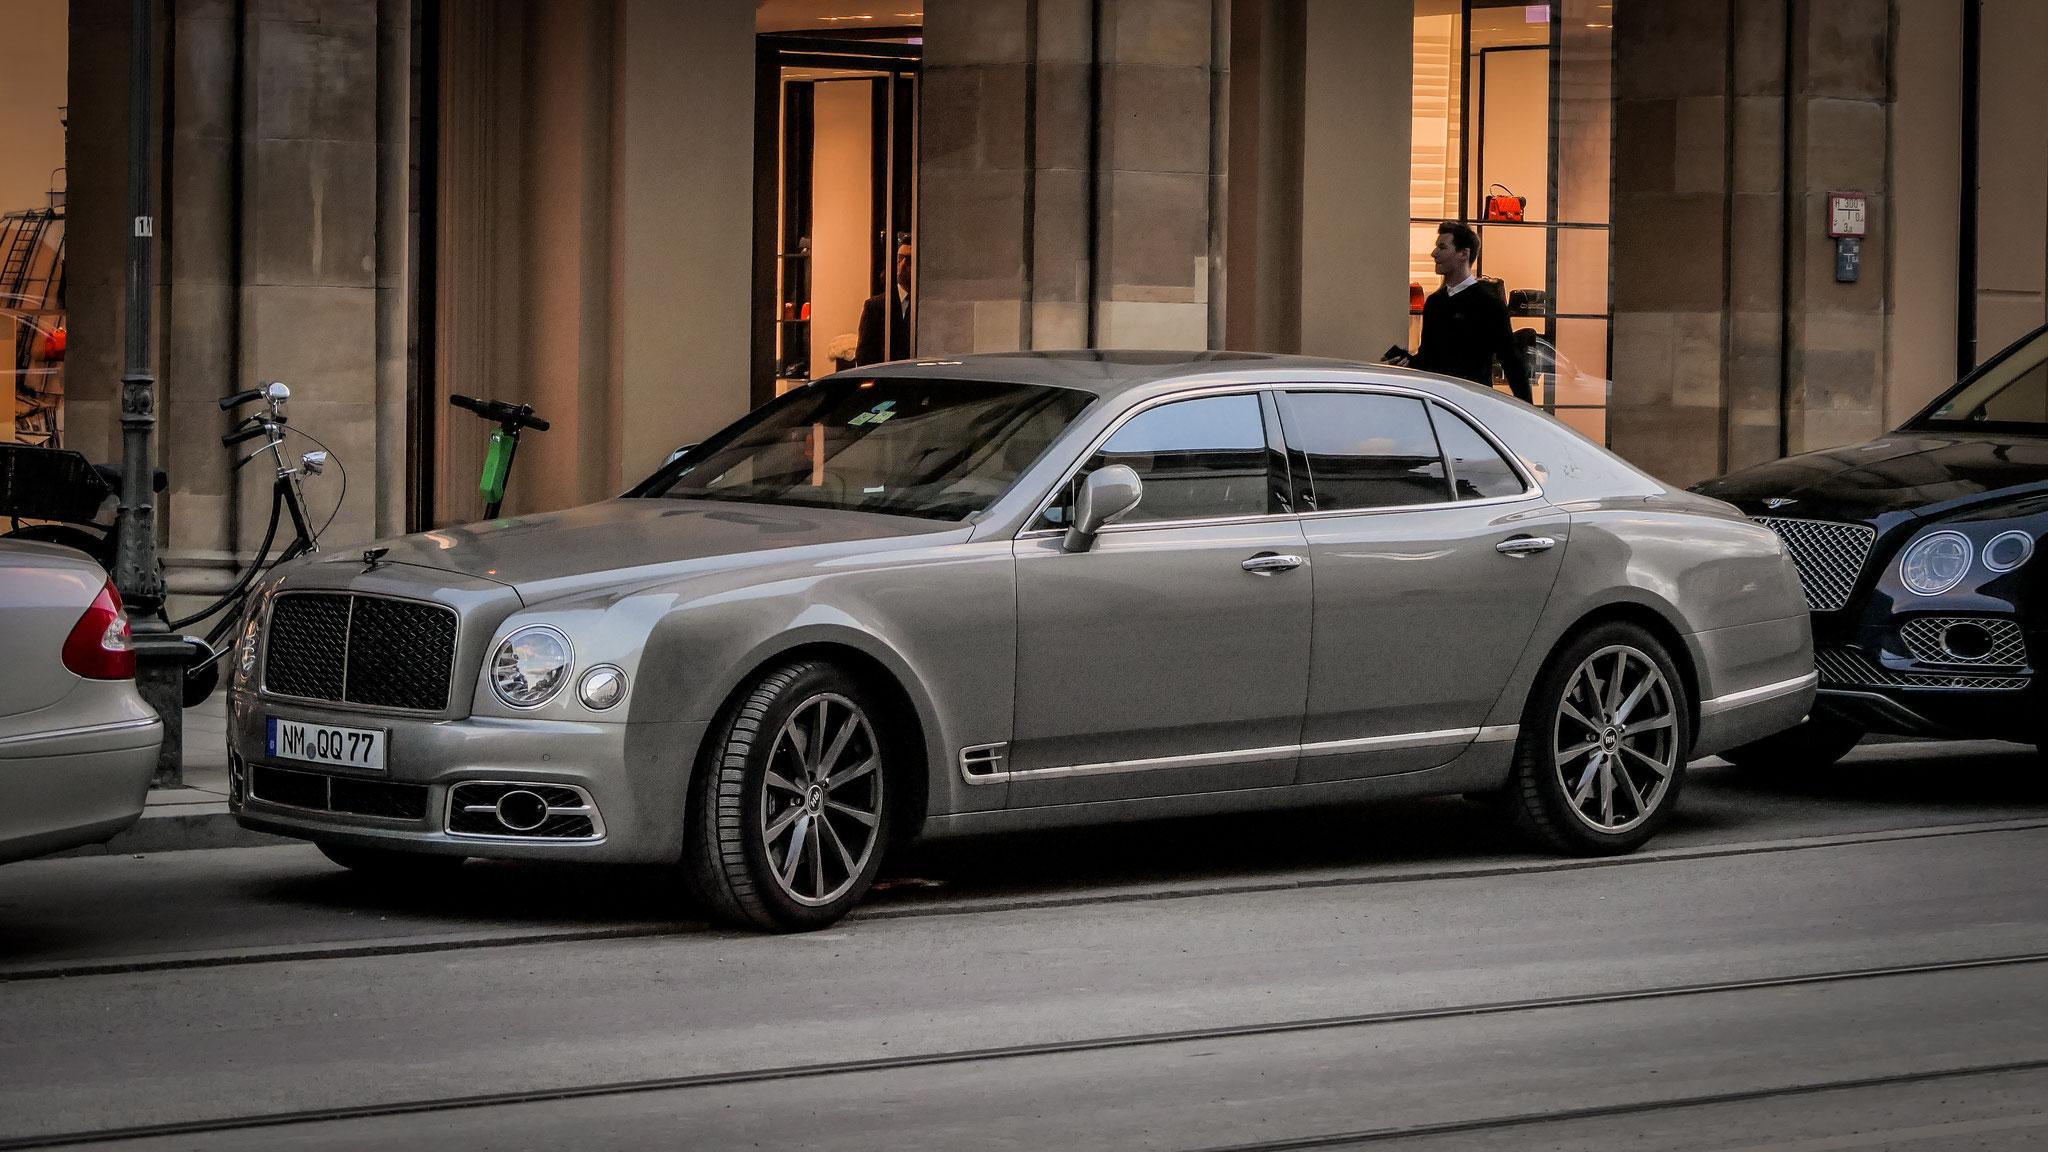 Bentley Mulsanne - NM-QQ-77